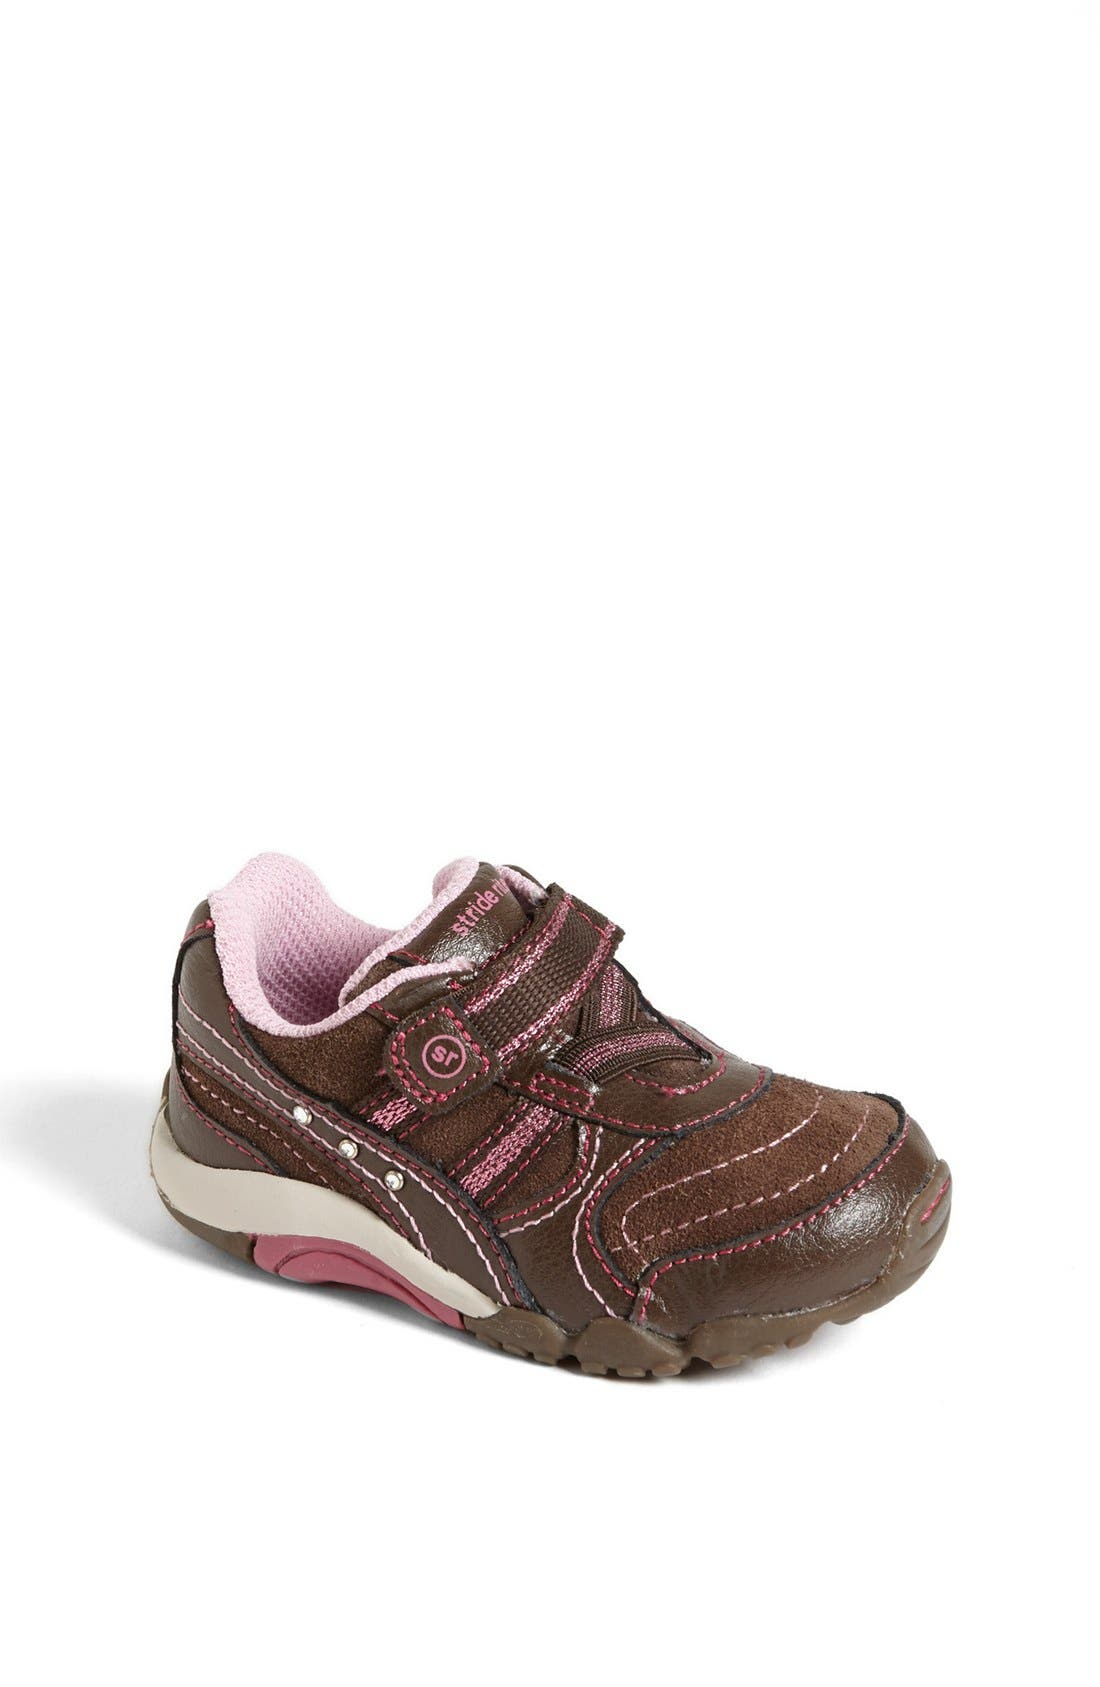 Alternate Image 1 Selected - Stride Rite 'Lydia' Sneaker (Baby, Walker & Toddler)